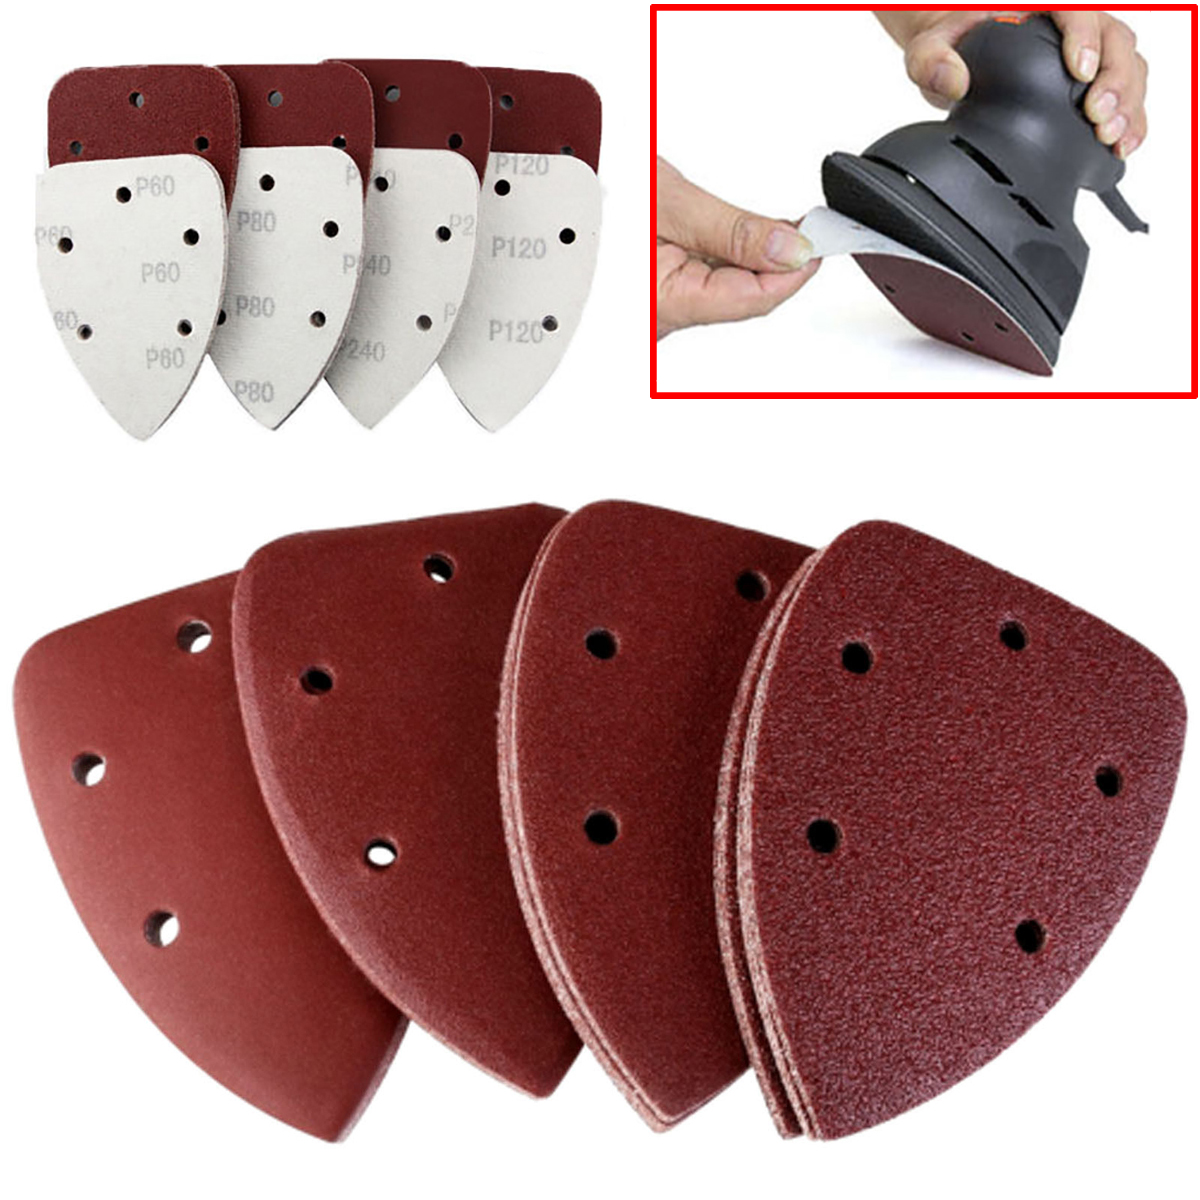 40pcs 40/80/120/240 Grits Sanding Disc Mouse Sander Pads Sandpaper For Polishing Tools 140x100mm40pcs 40/80/120/240 Grits Sanding Disc Mouse Sander Pads Sandpaper For Polishing Tools 140x100mm